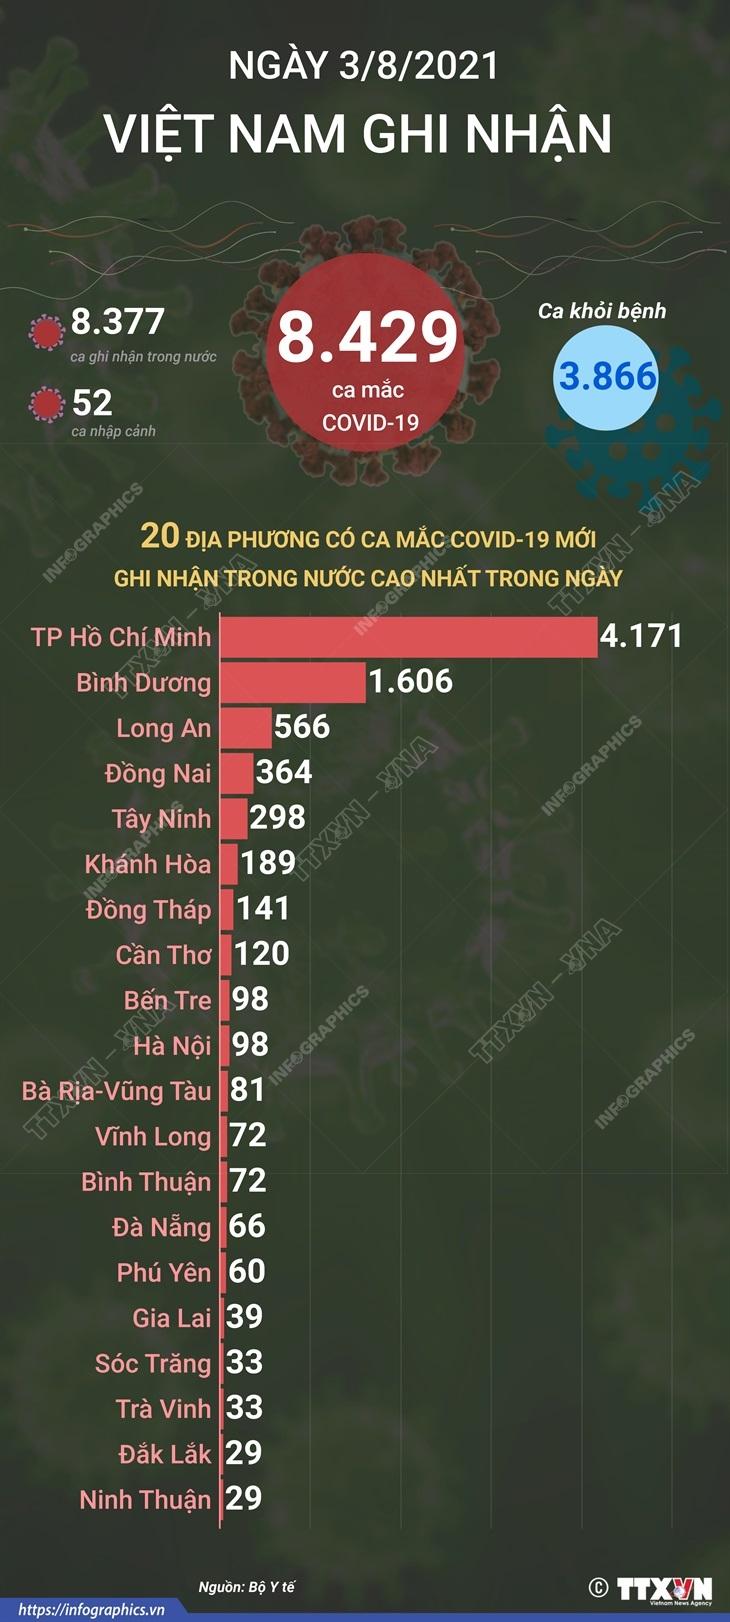 [Infographics] Viet Nam ghi nhan 8.429 ca mac COVID-19 trong ngay 3/8 hinh anh 1